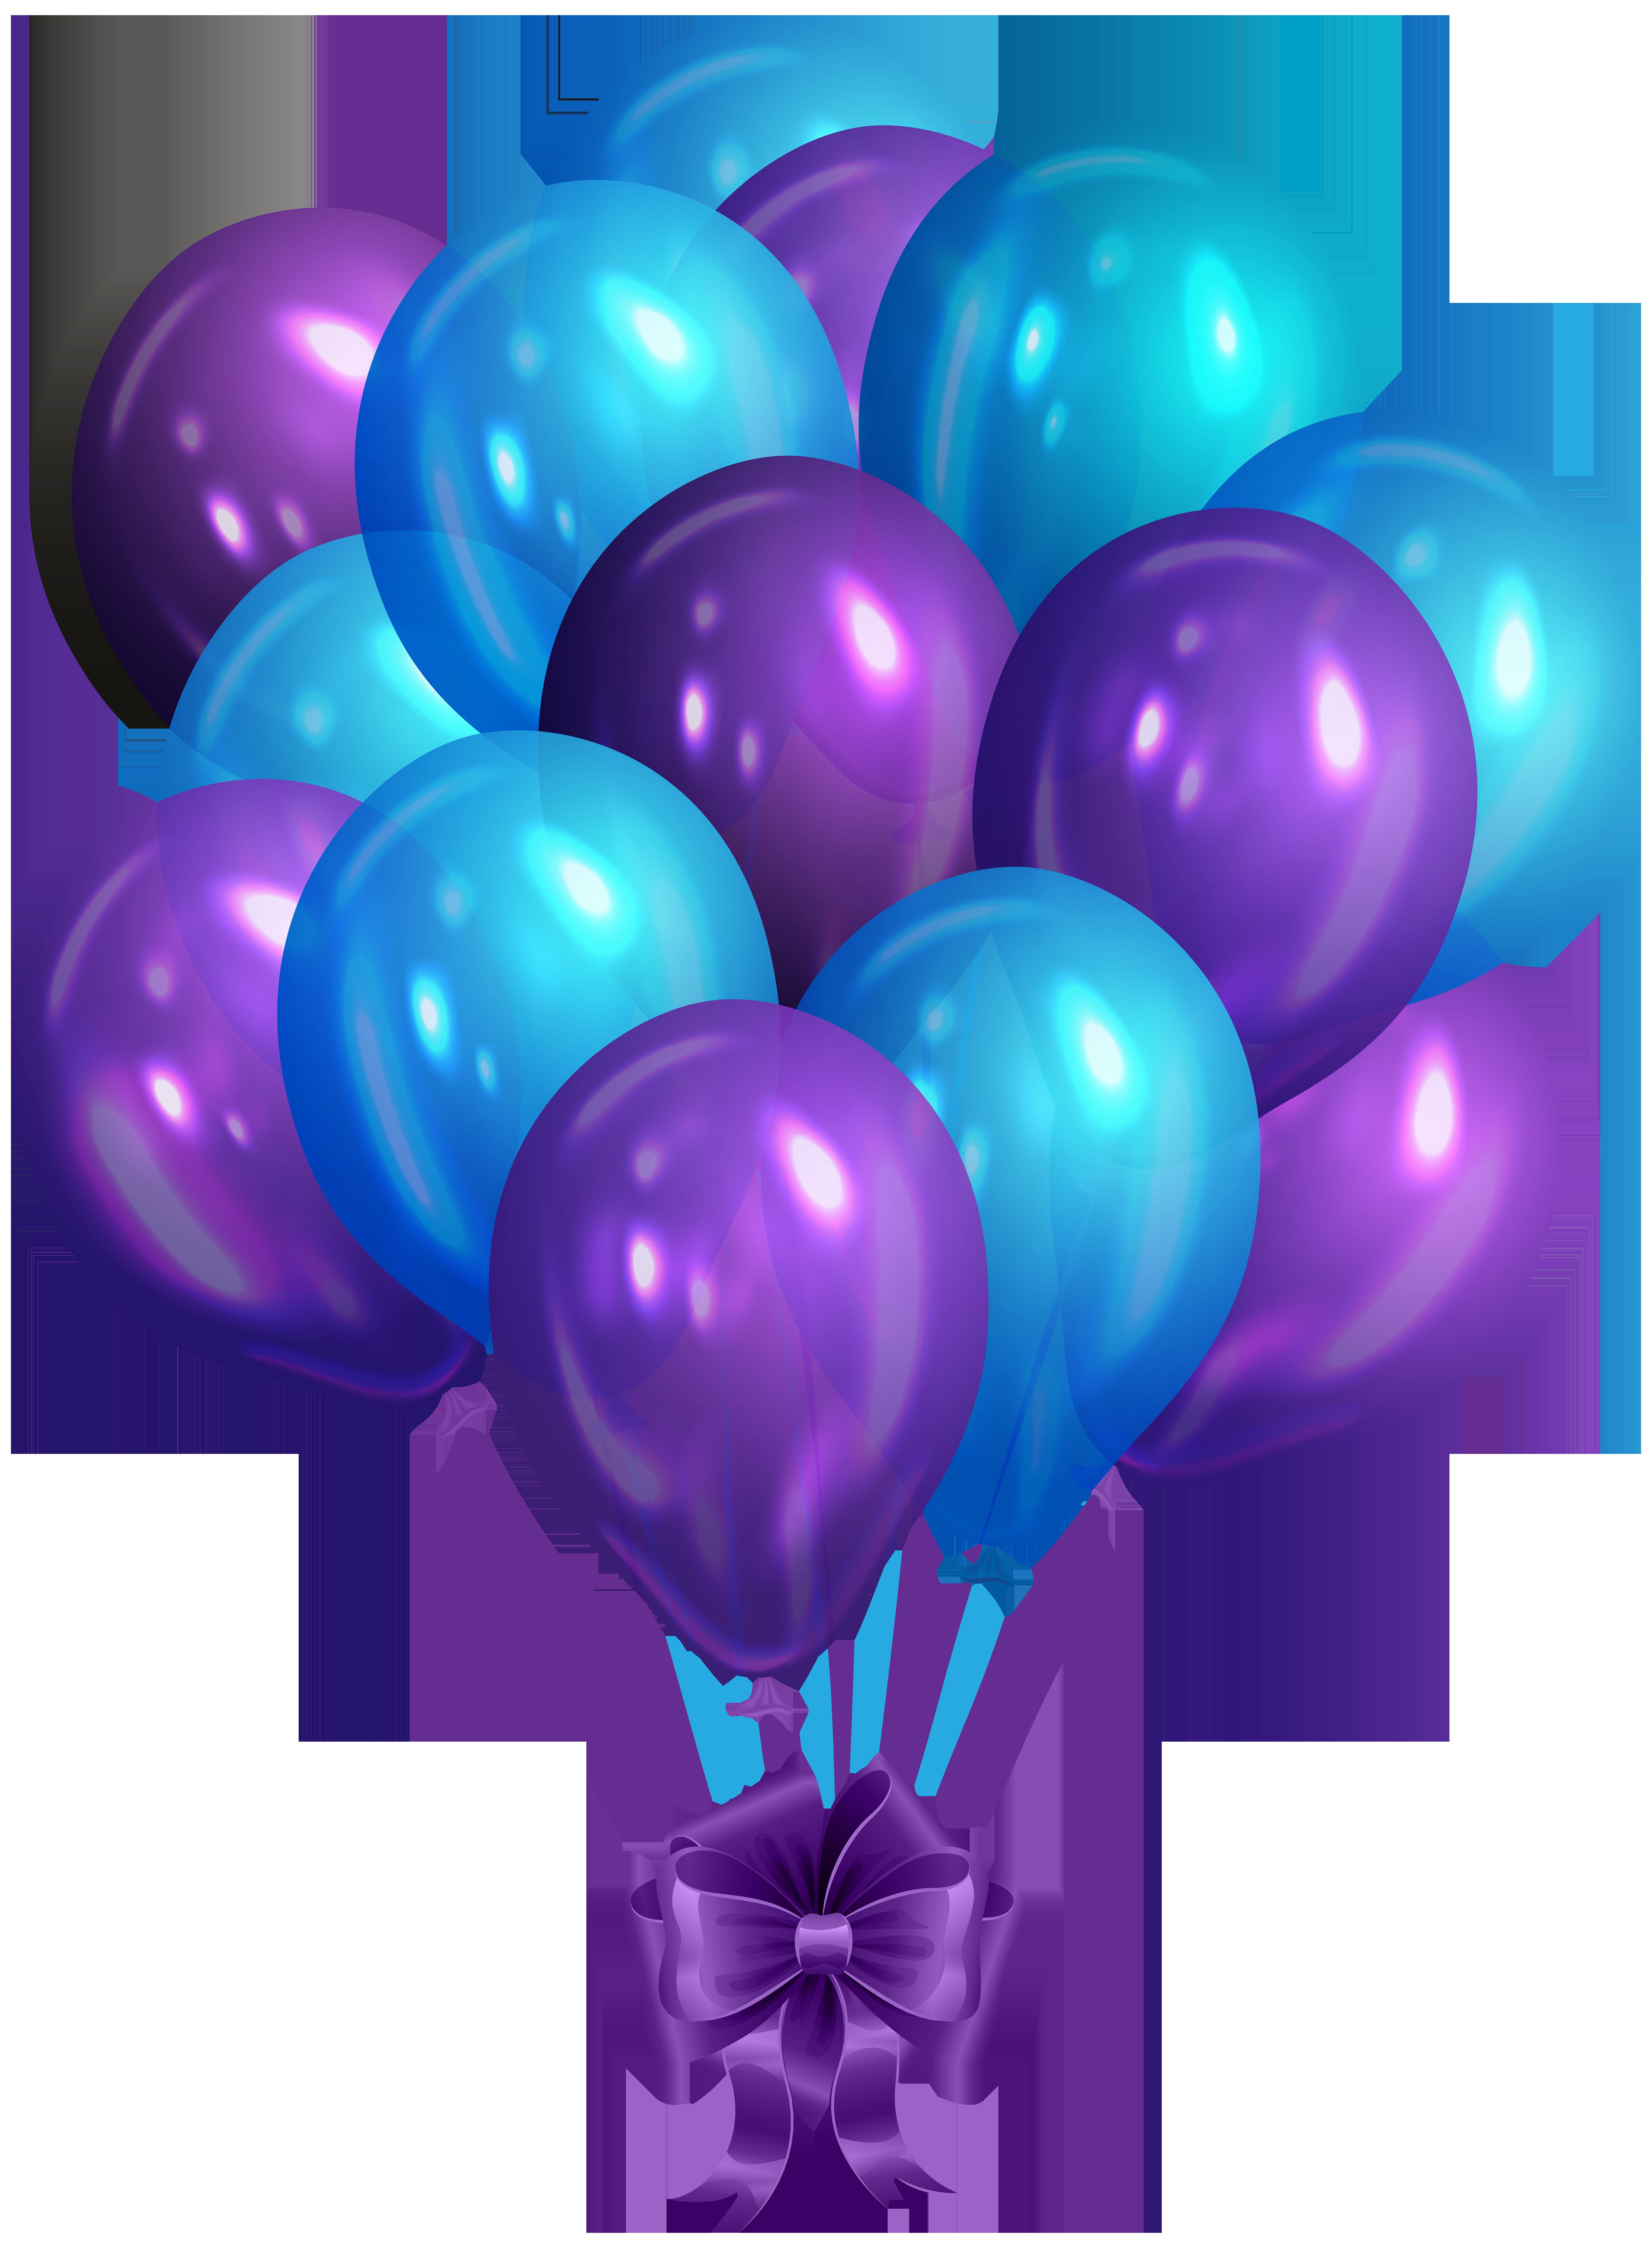 Lavender clipart lavender bunch. Blue purple of balloons